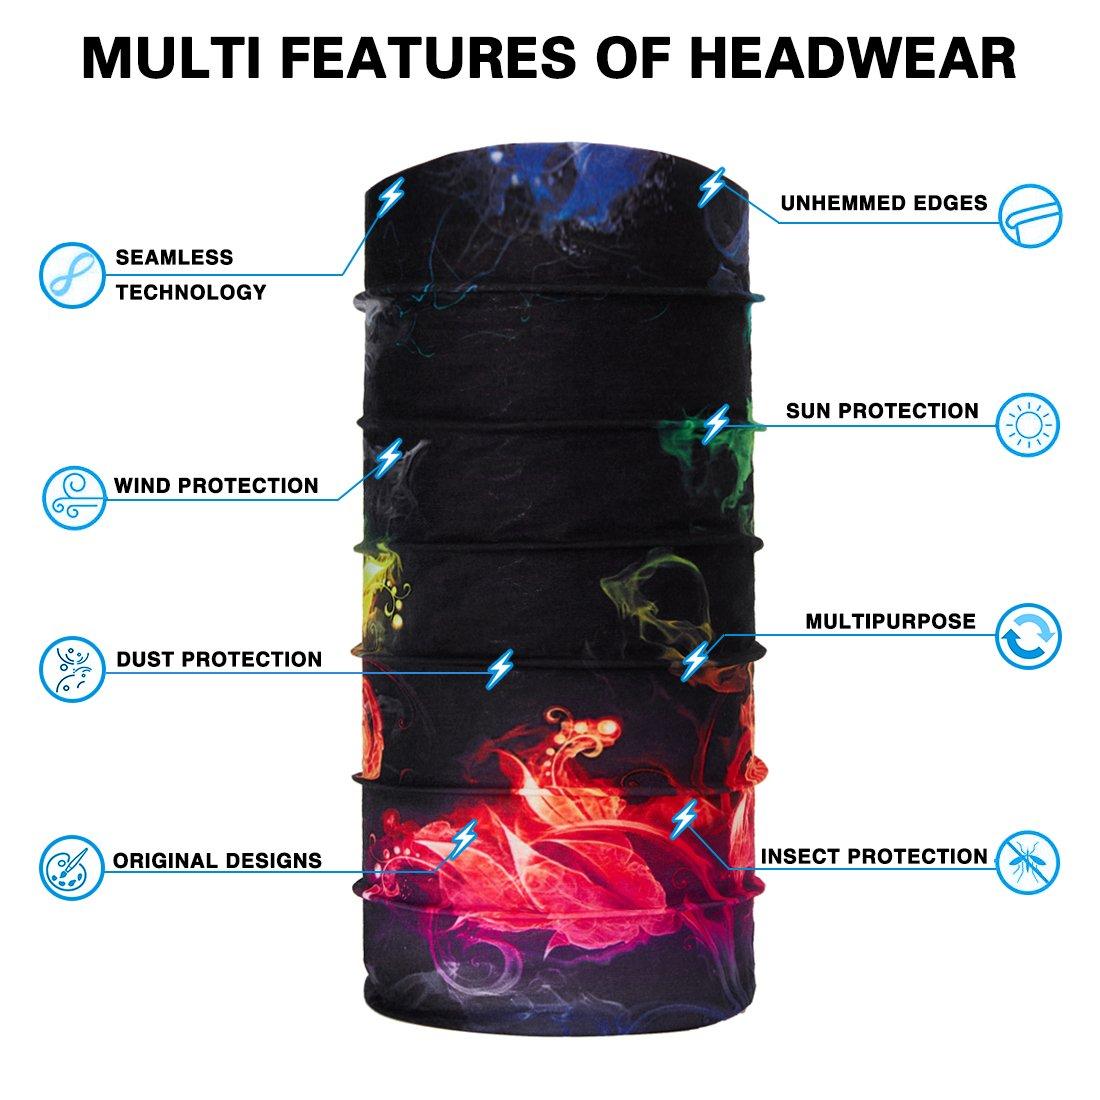 TUONROAD 3D Printed Blue Leaves Magic Headband Sweatband Custom SPF Scarf Tube Bandana Multifunctional Headwear for Snowboarding Skiing Riding